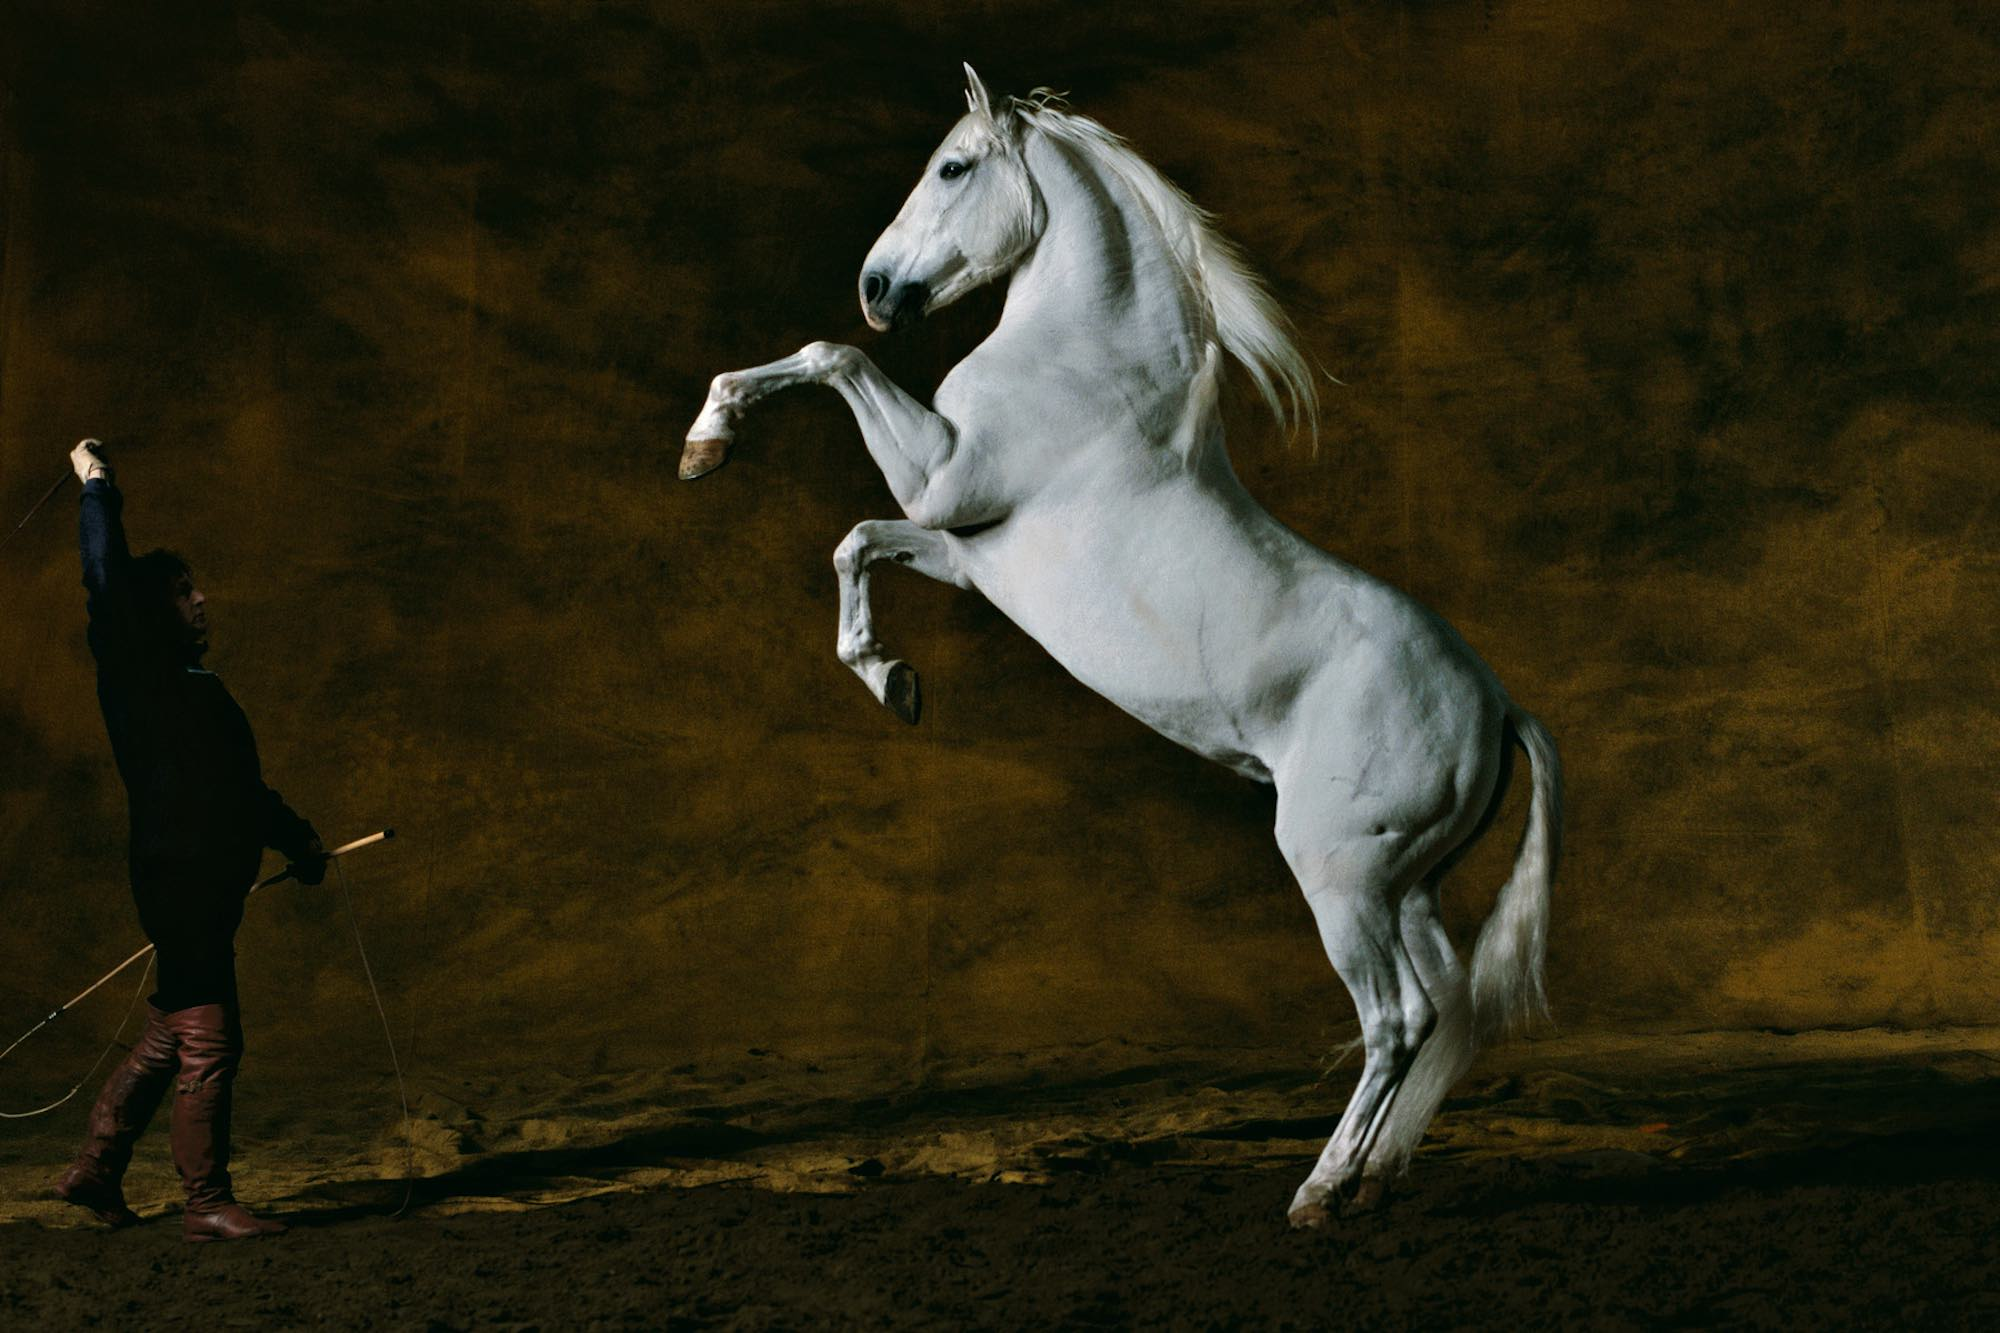 Cheval pure-race Espagnole - Yann Arthus-Bertrand